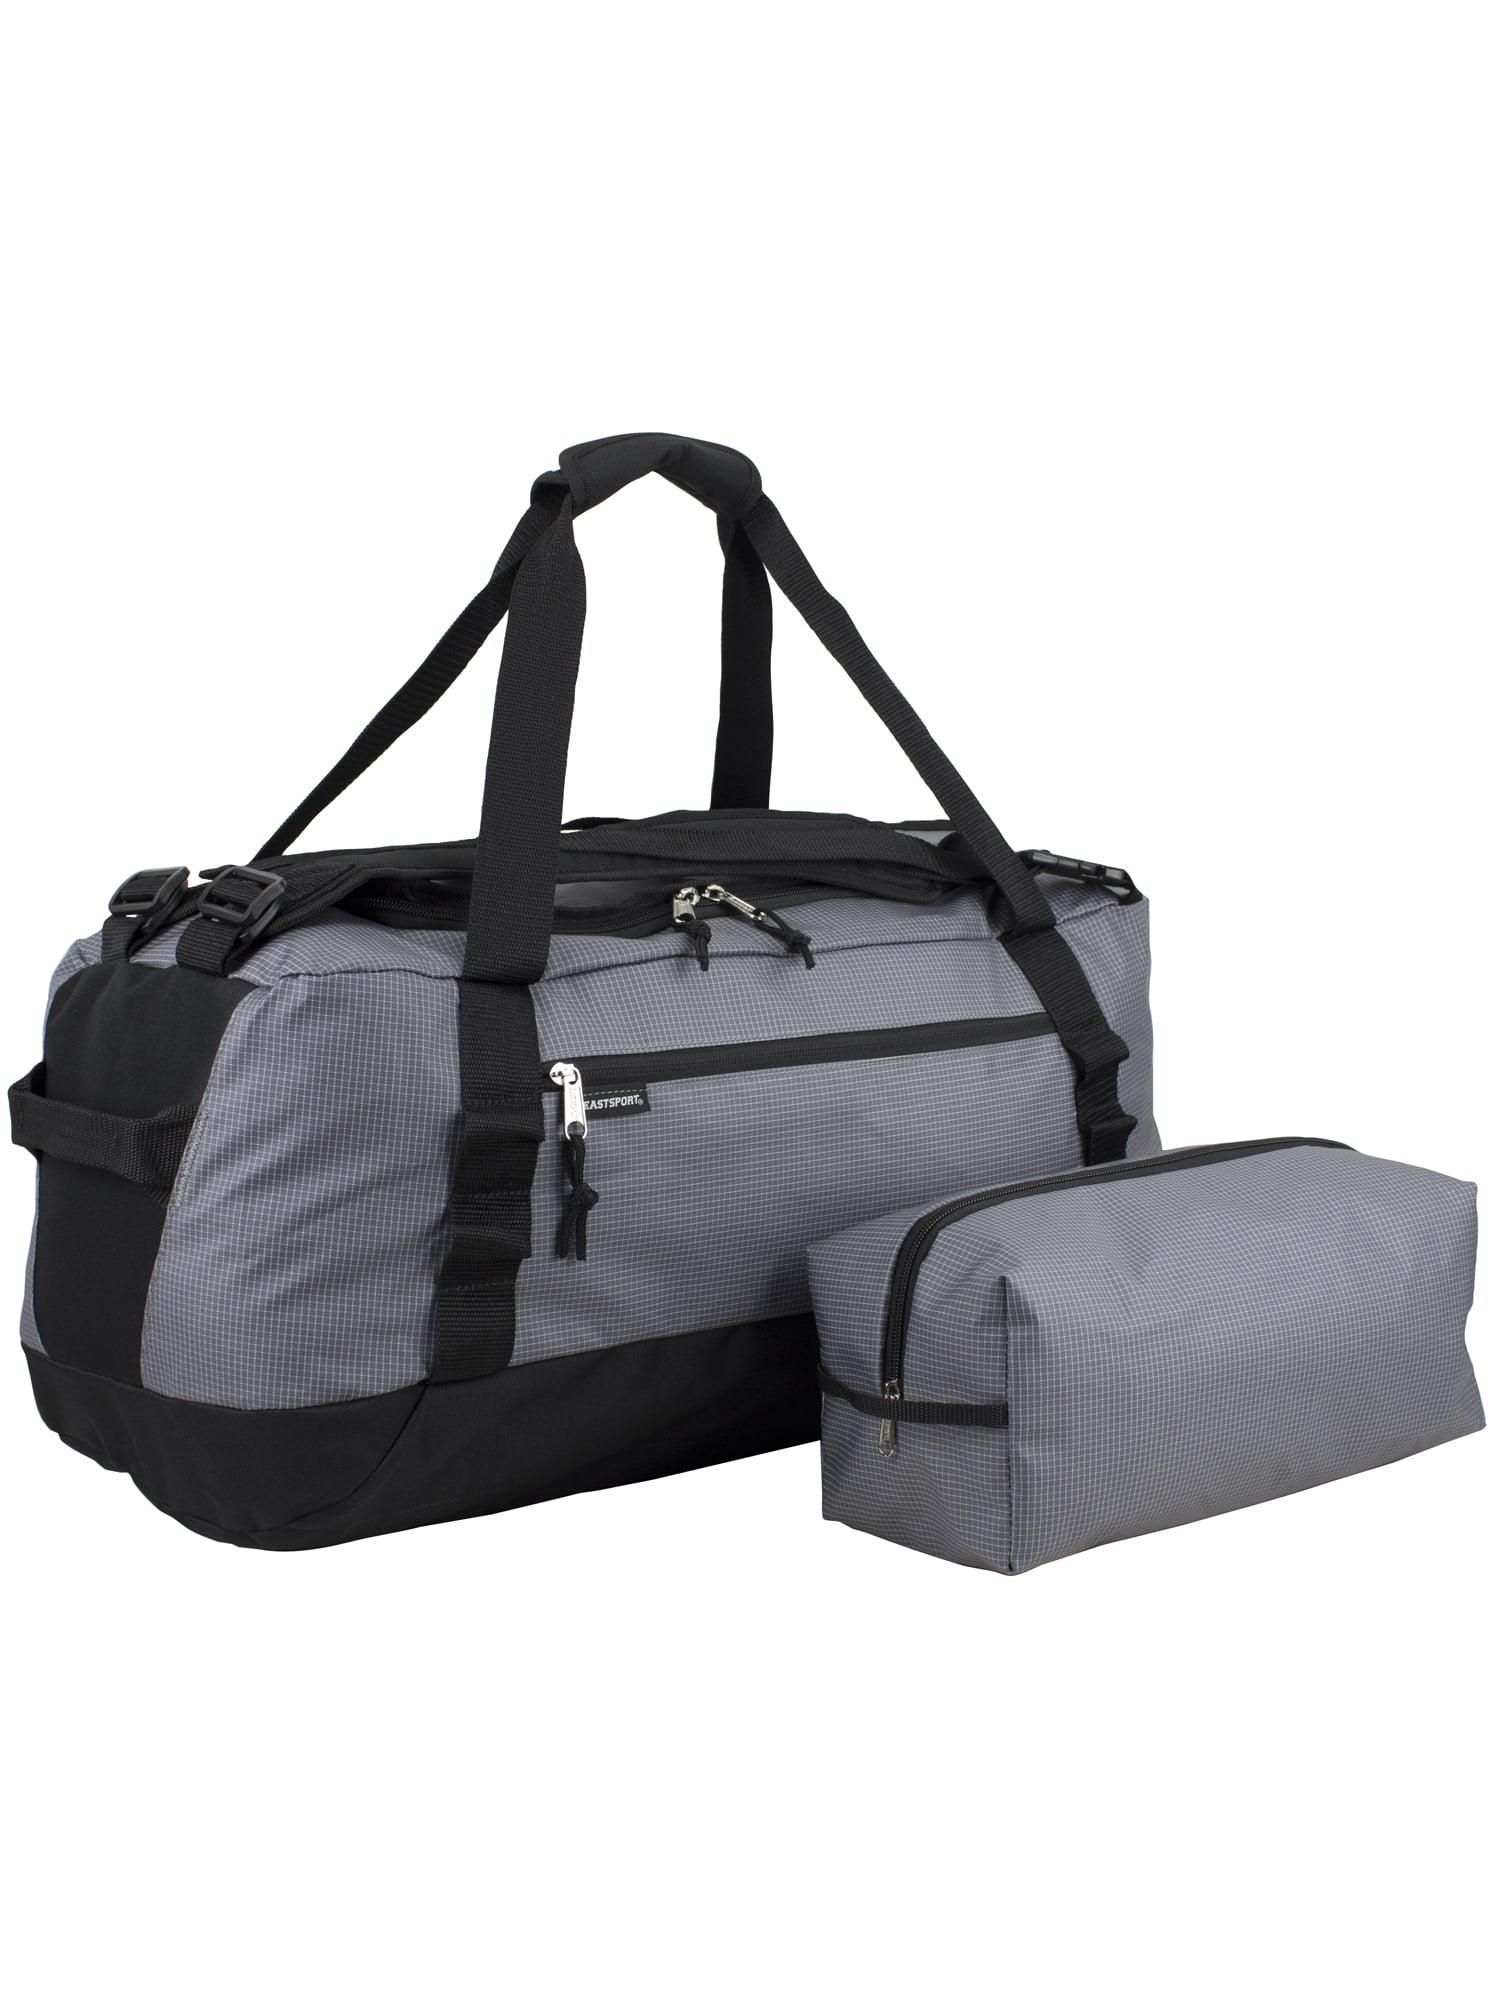 Eastsport Large Duffel Convertible Backpack